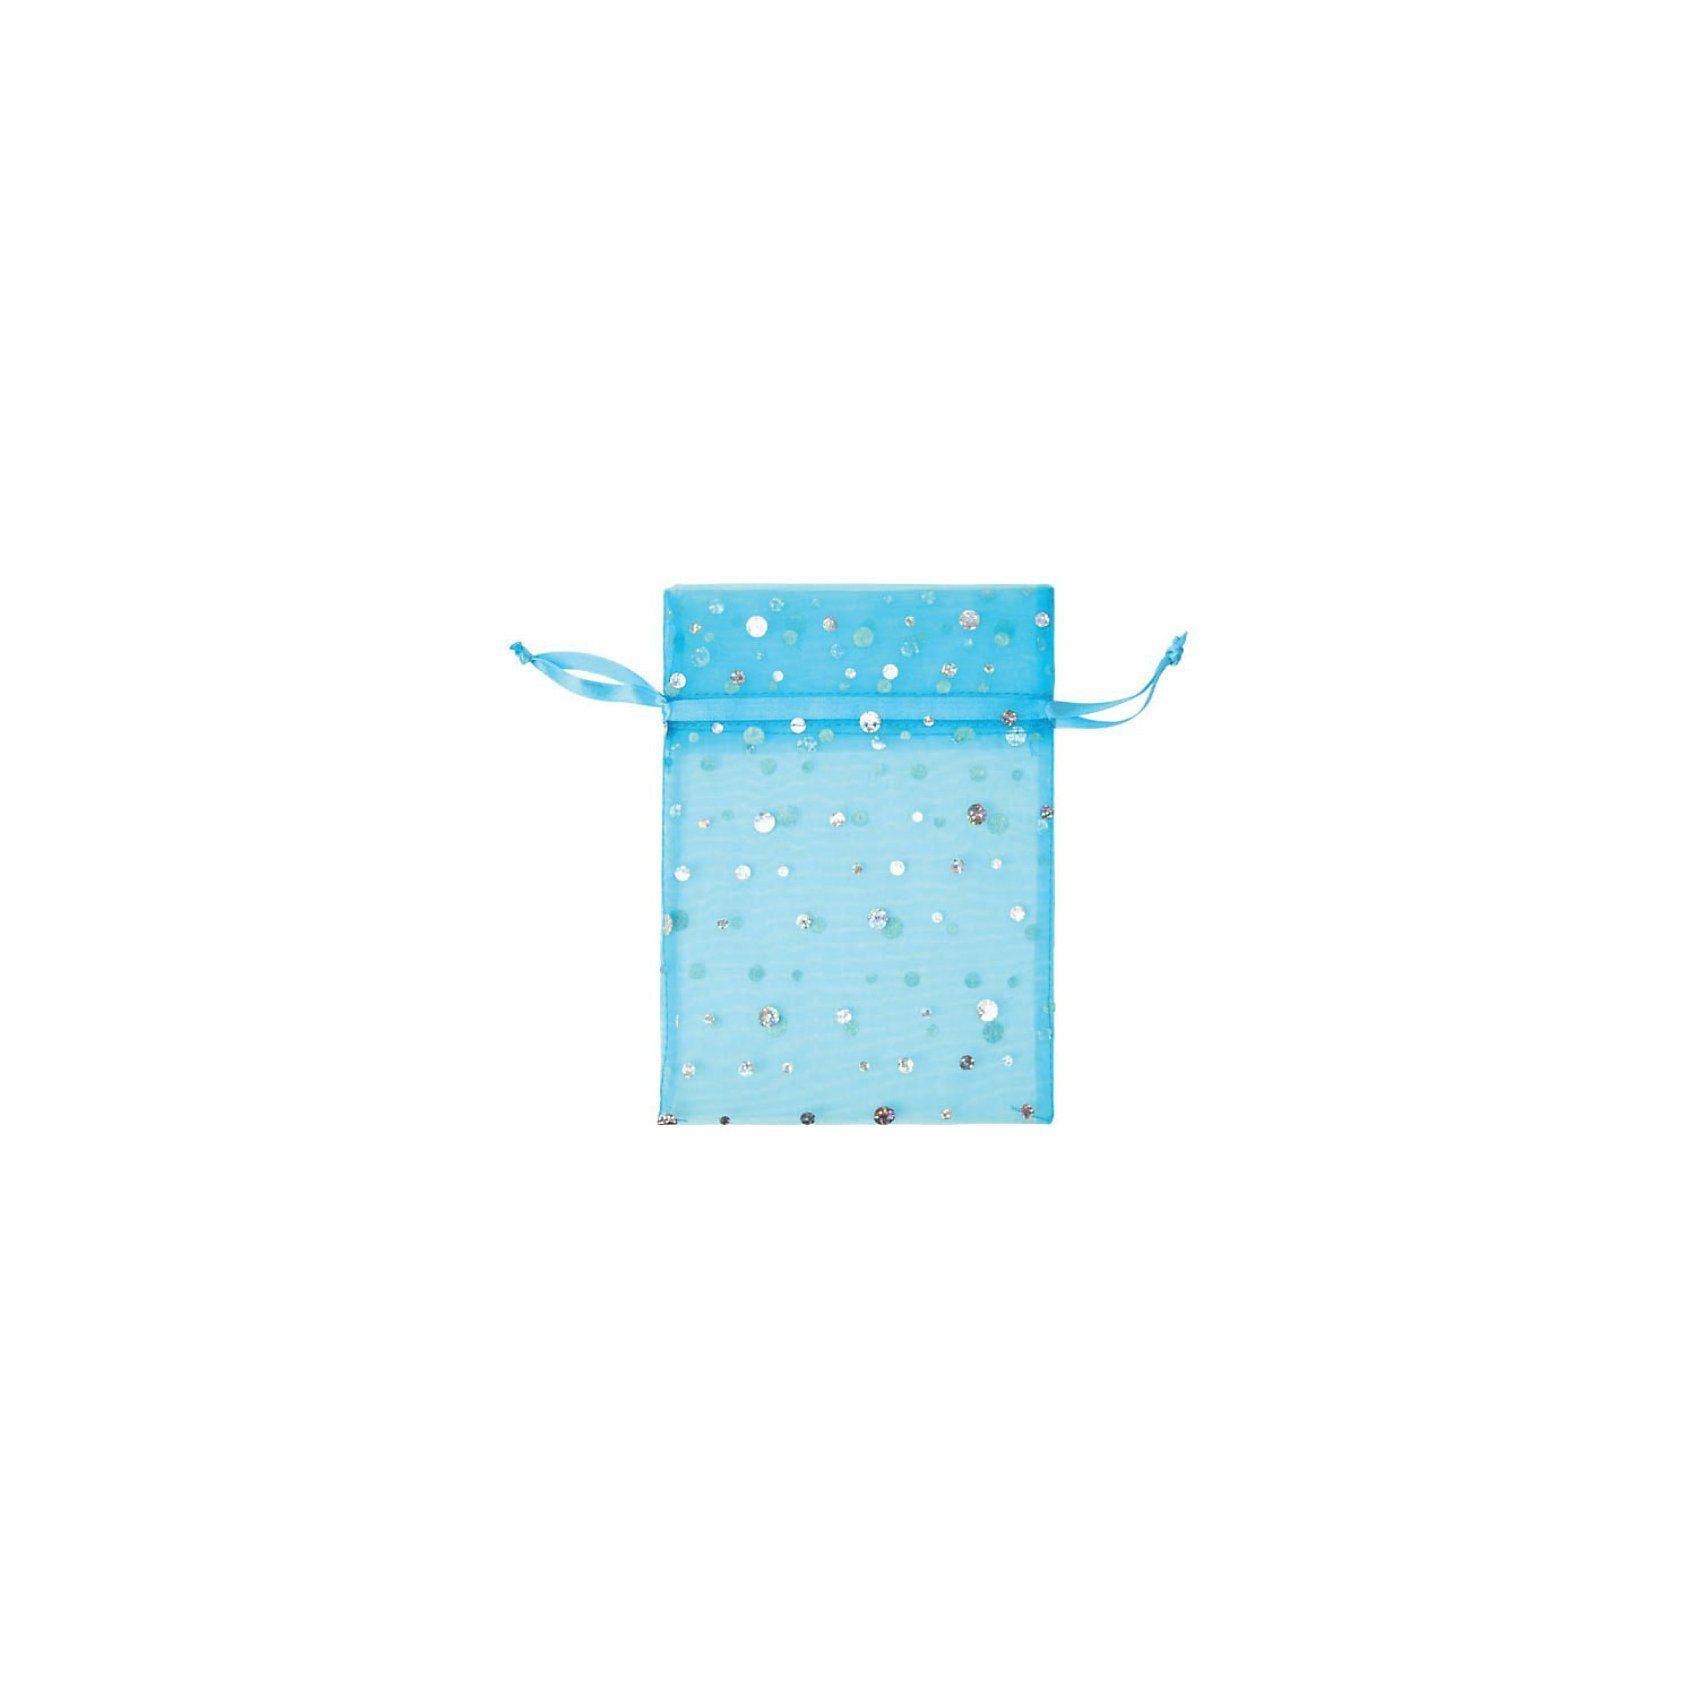 Hotex Chiffonbeutel 13 x 18 cm Glitzerpunkte blau, 12 Stück